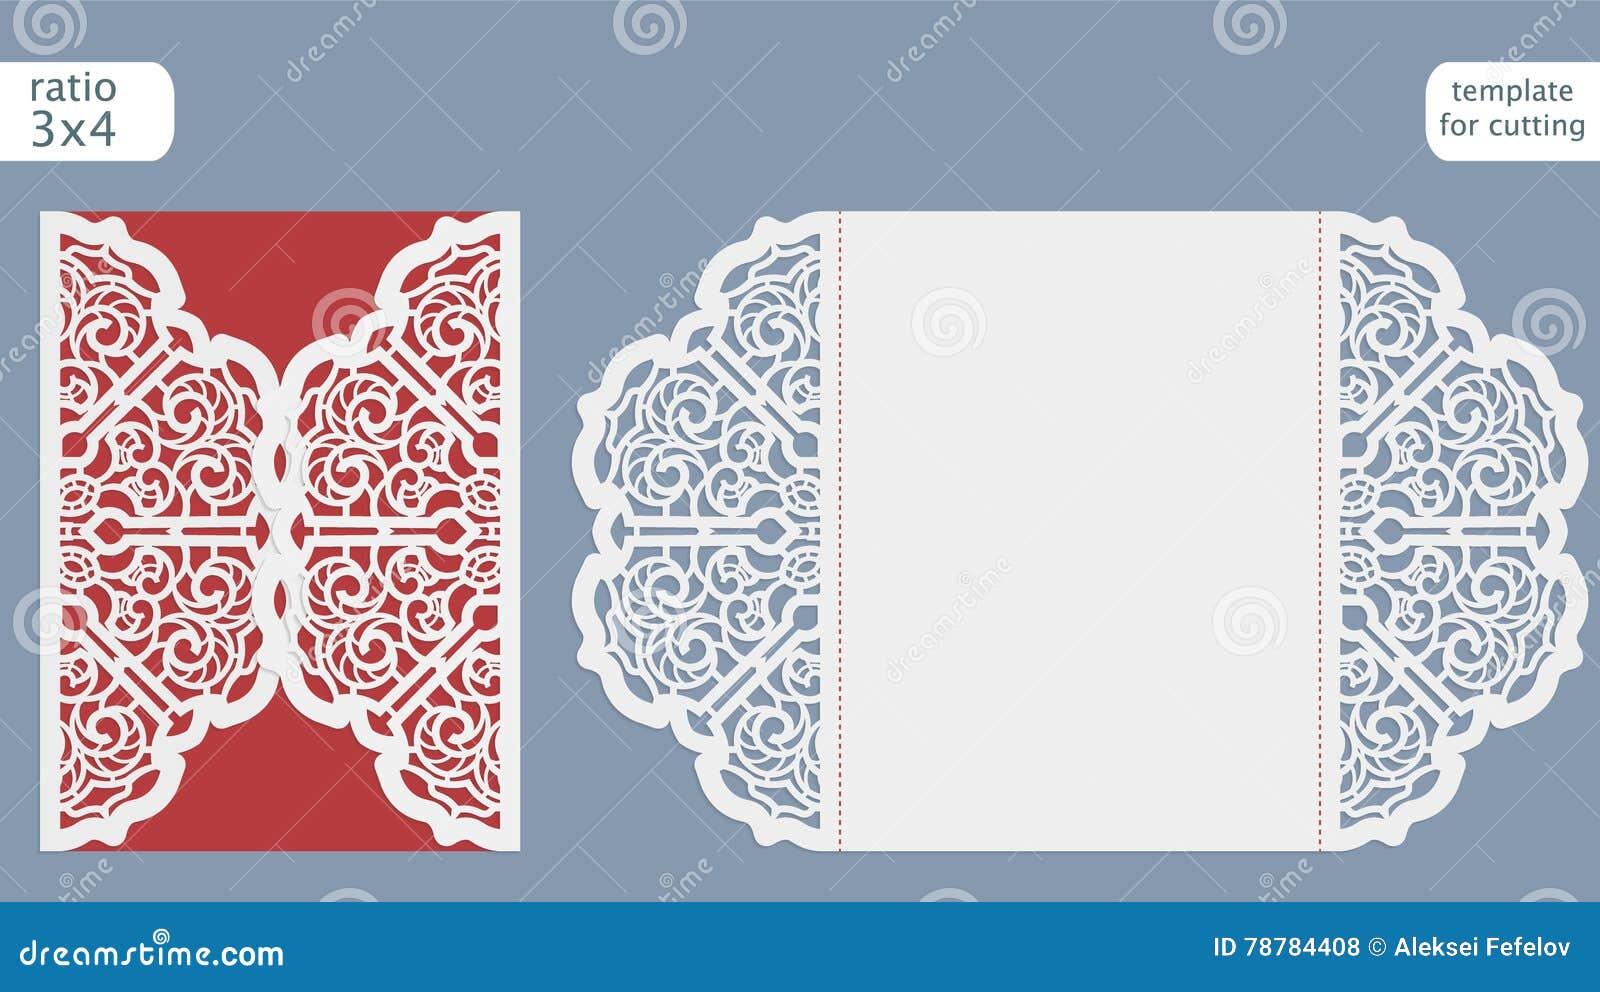 Wedding Invitation Card Paper: Laser Cut Wedding Invitation Card Template. Cut Out The